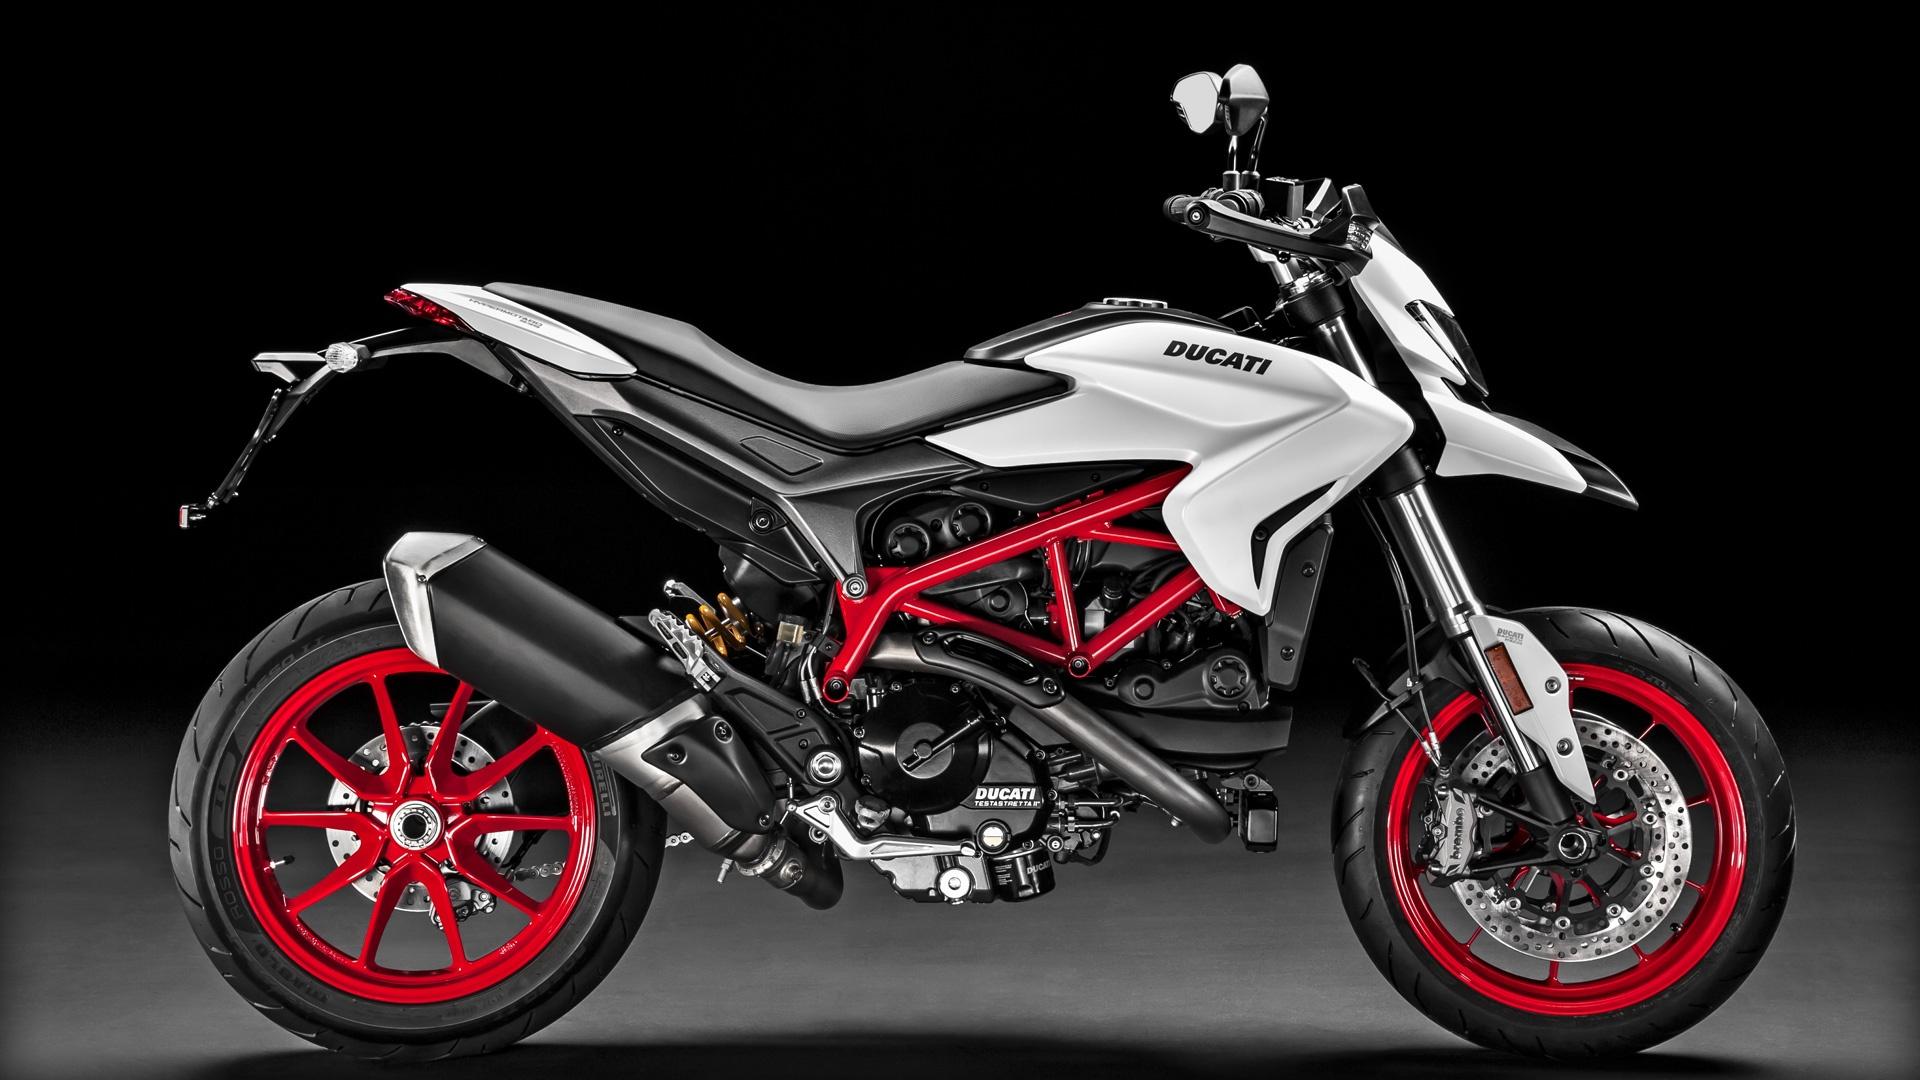 МОТОЦИКЛ DUCATI HYPERMOTARD 939 ― Артмото - купить квадроцикл в украине и харькове, мотоцикл, снегоход, скутер, мопед, электромобиль